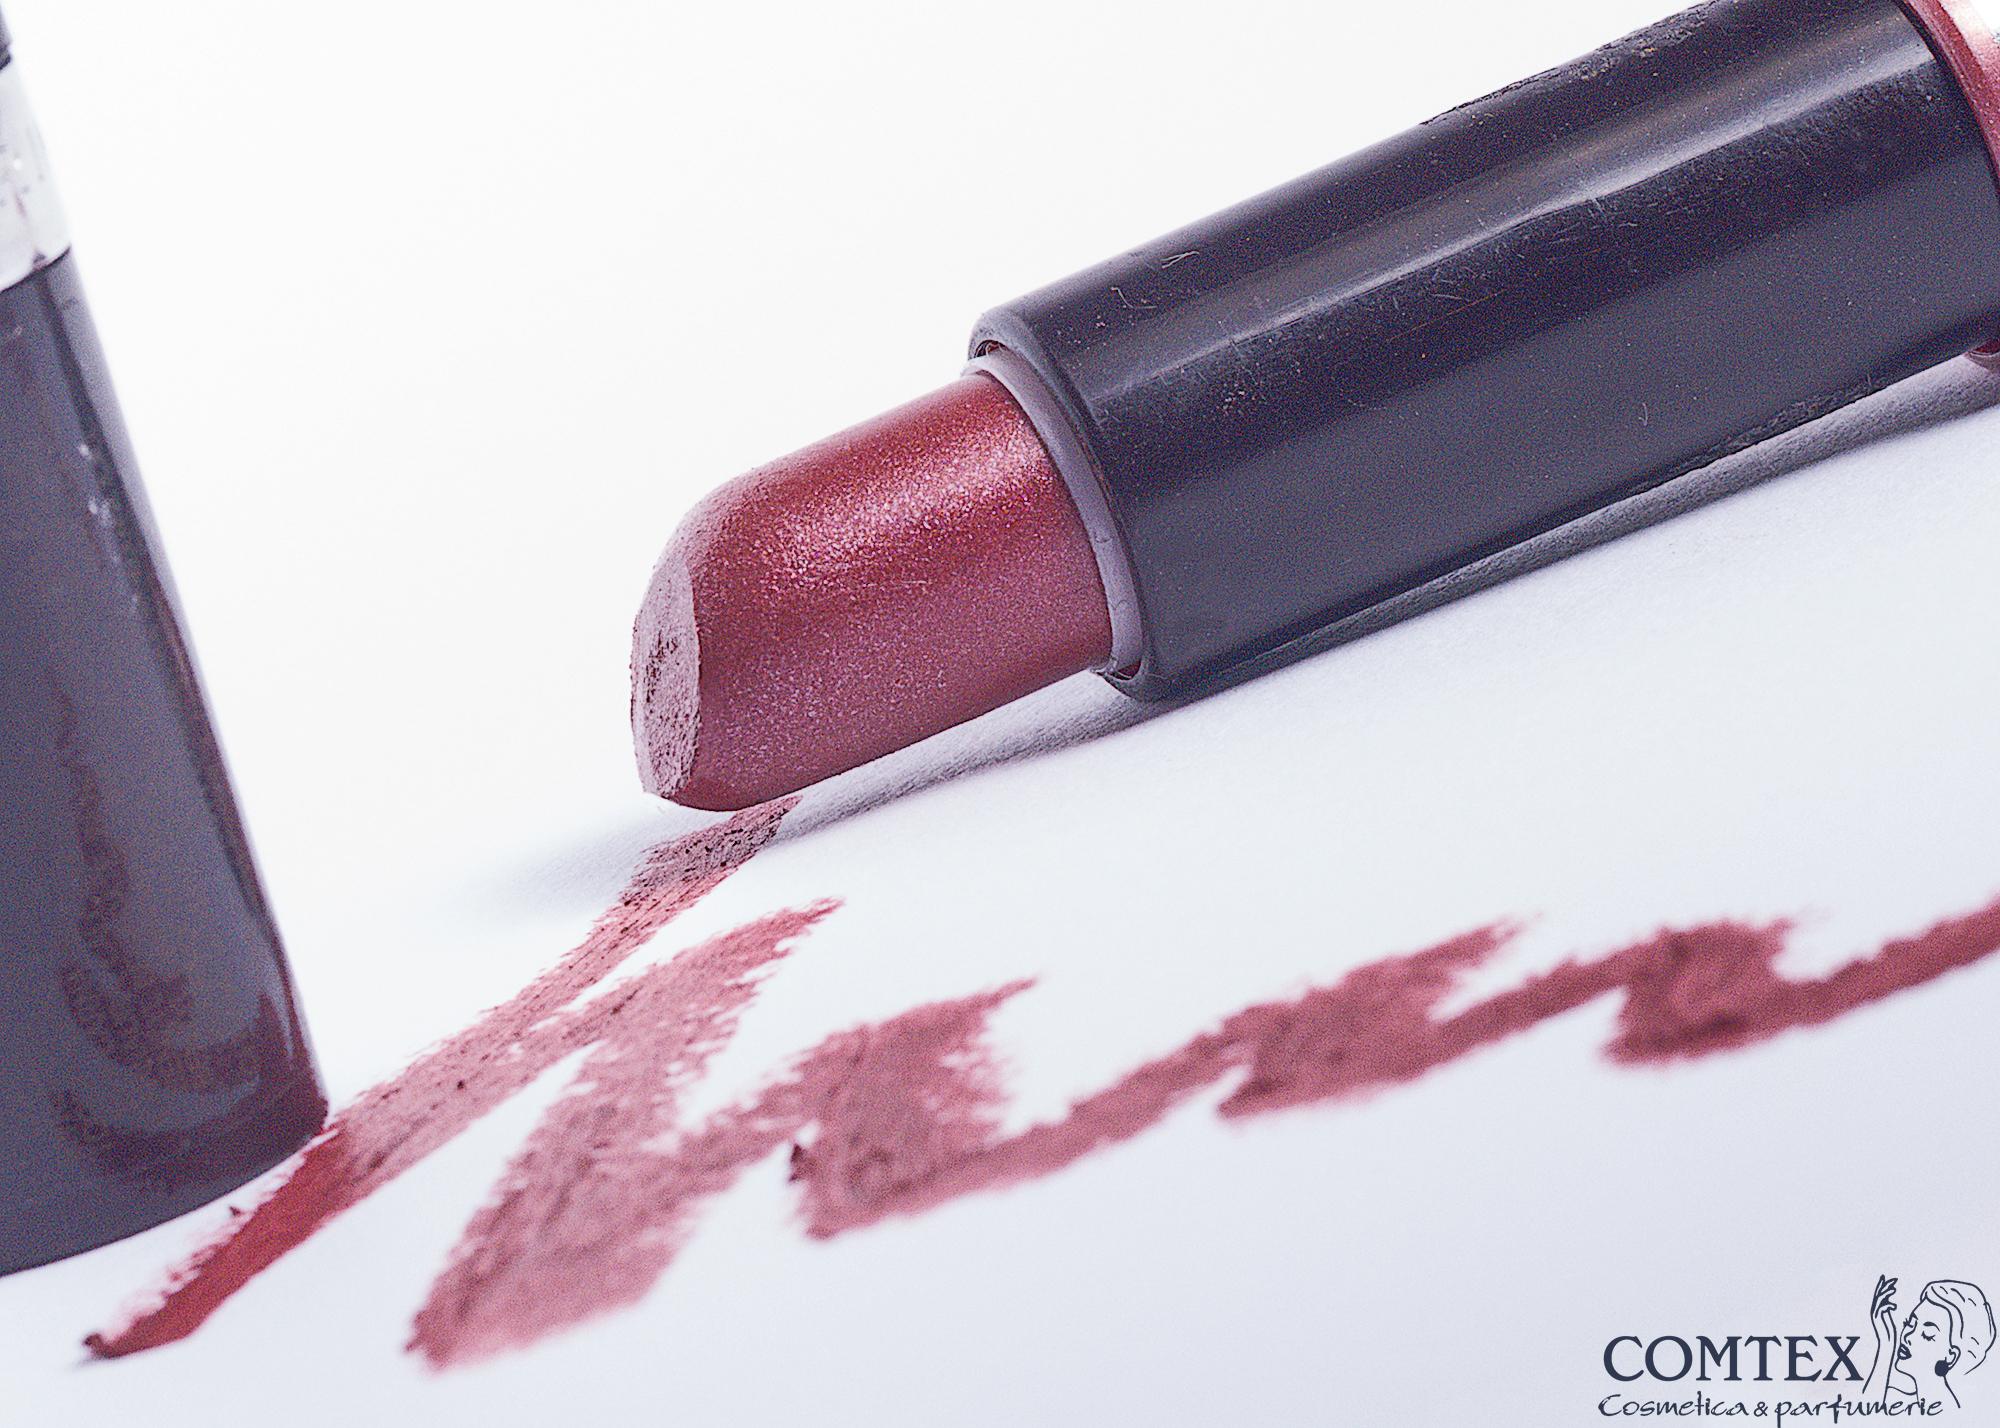 De La Rimmel London, Un Ruj In Tonuri Asemanatoare Marsala, Lasting Finish Lipstick, De Tinuta Lunga, Nr.046